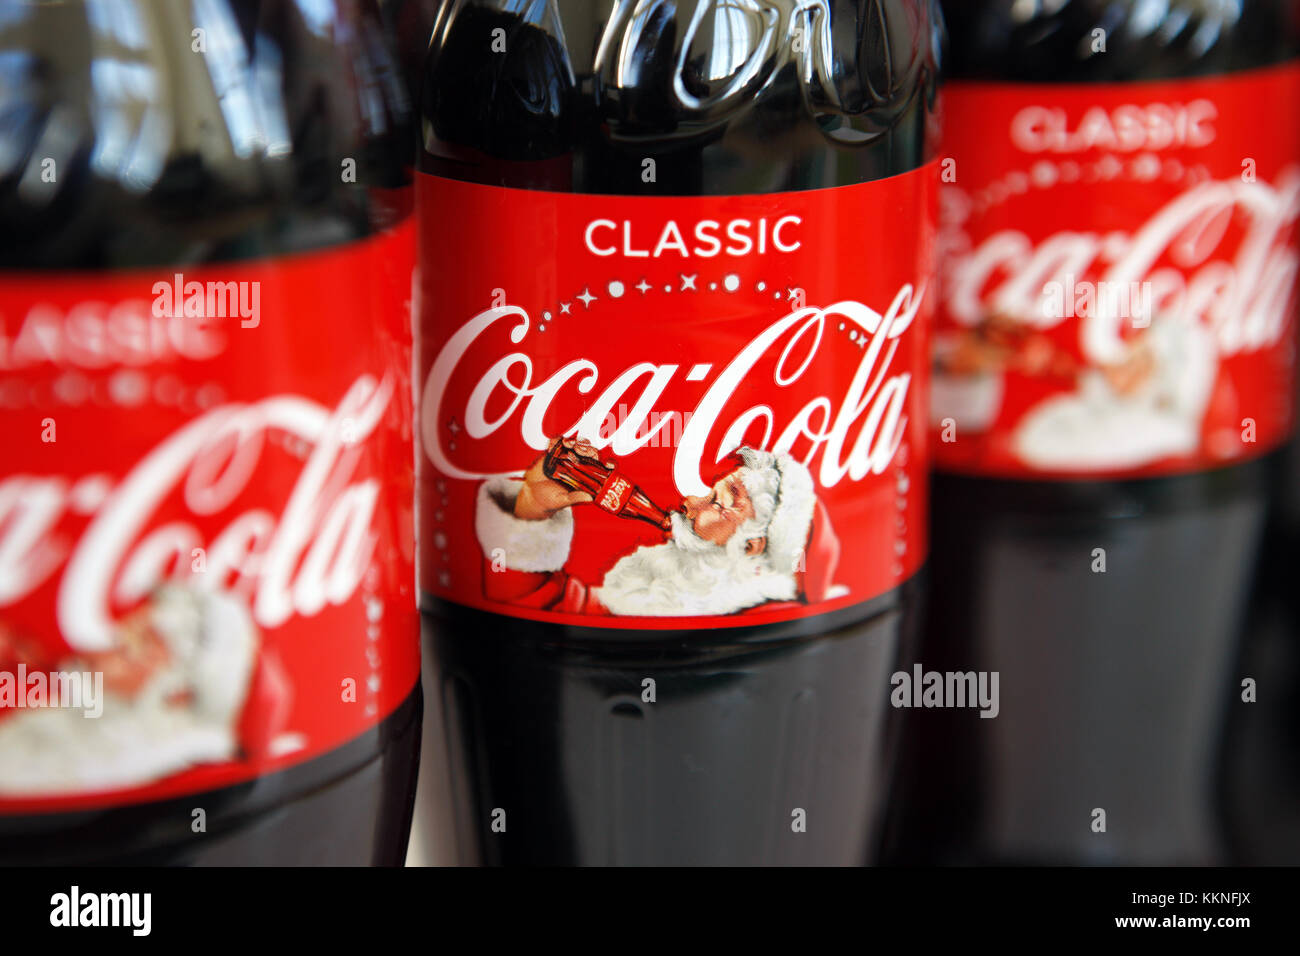 Coca Cola Christmas Bottle.Coca Cola Christmas Label Bottles Stock Photo 167045058 Alamy